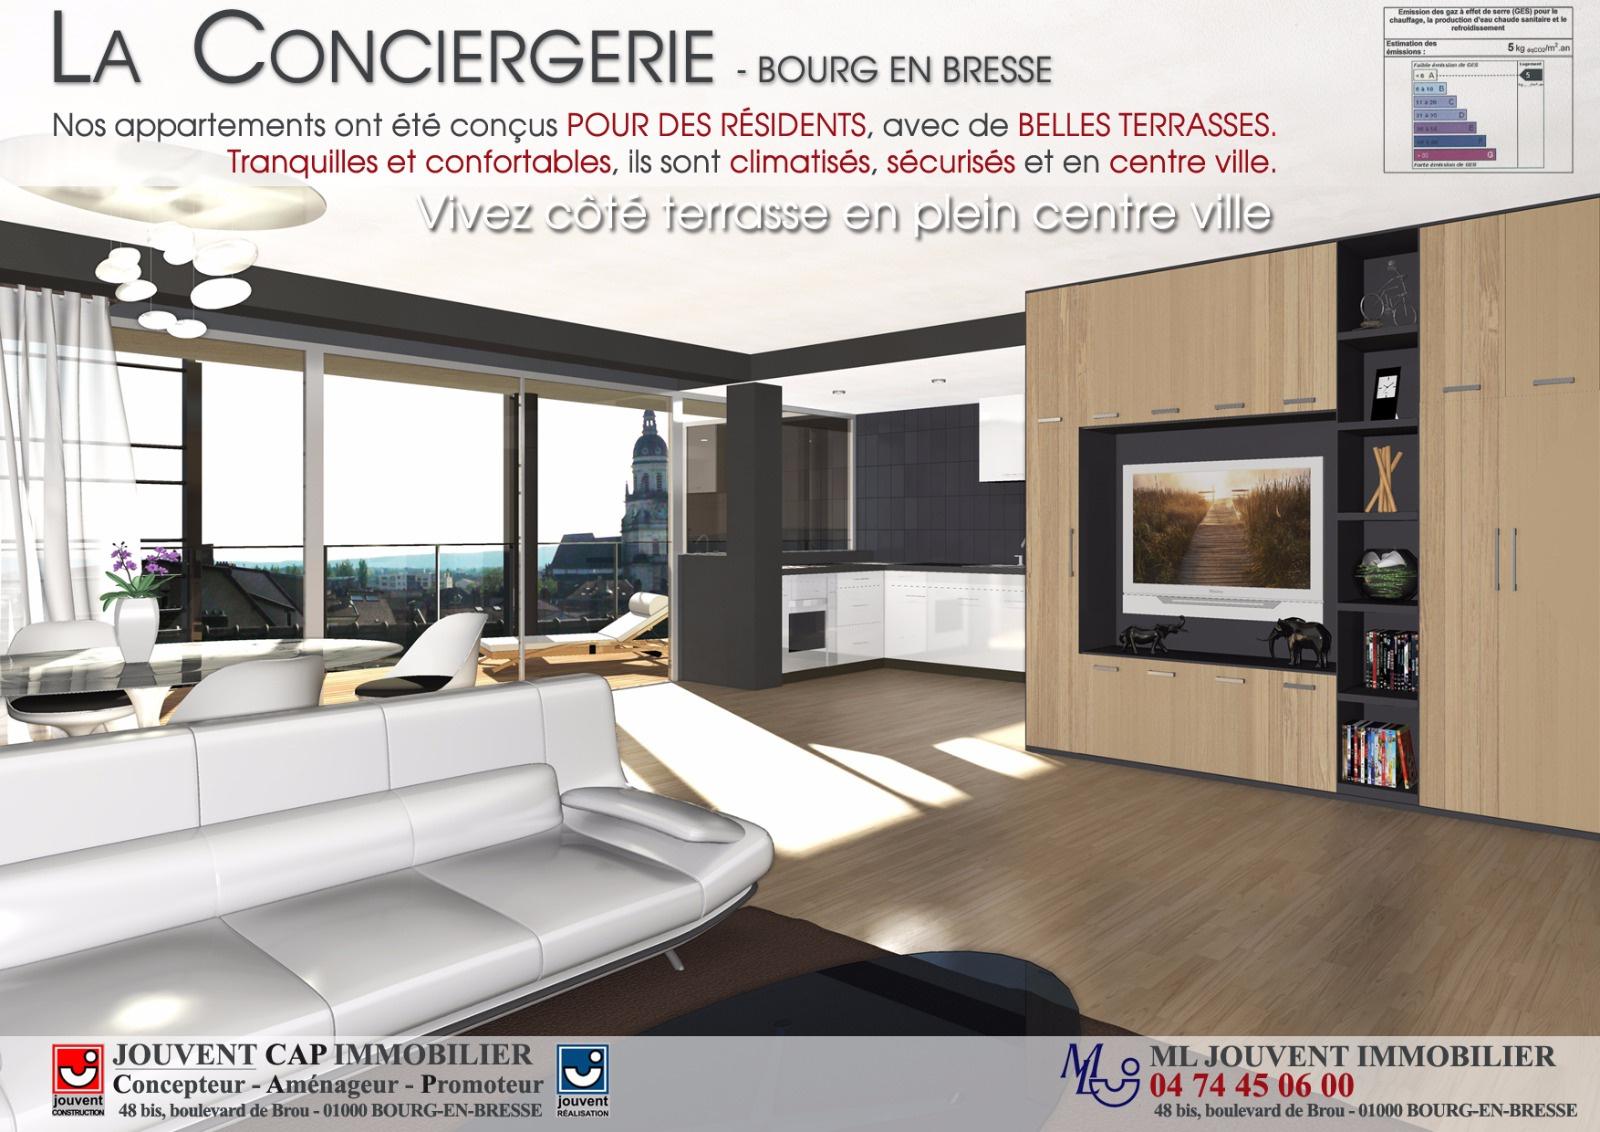 ml jouvent immobilier bourg en bresse location appartement vente maisons programme et immo neuf. Black Bedroom Furniture Sets. Home Design Ideas